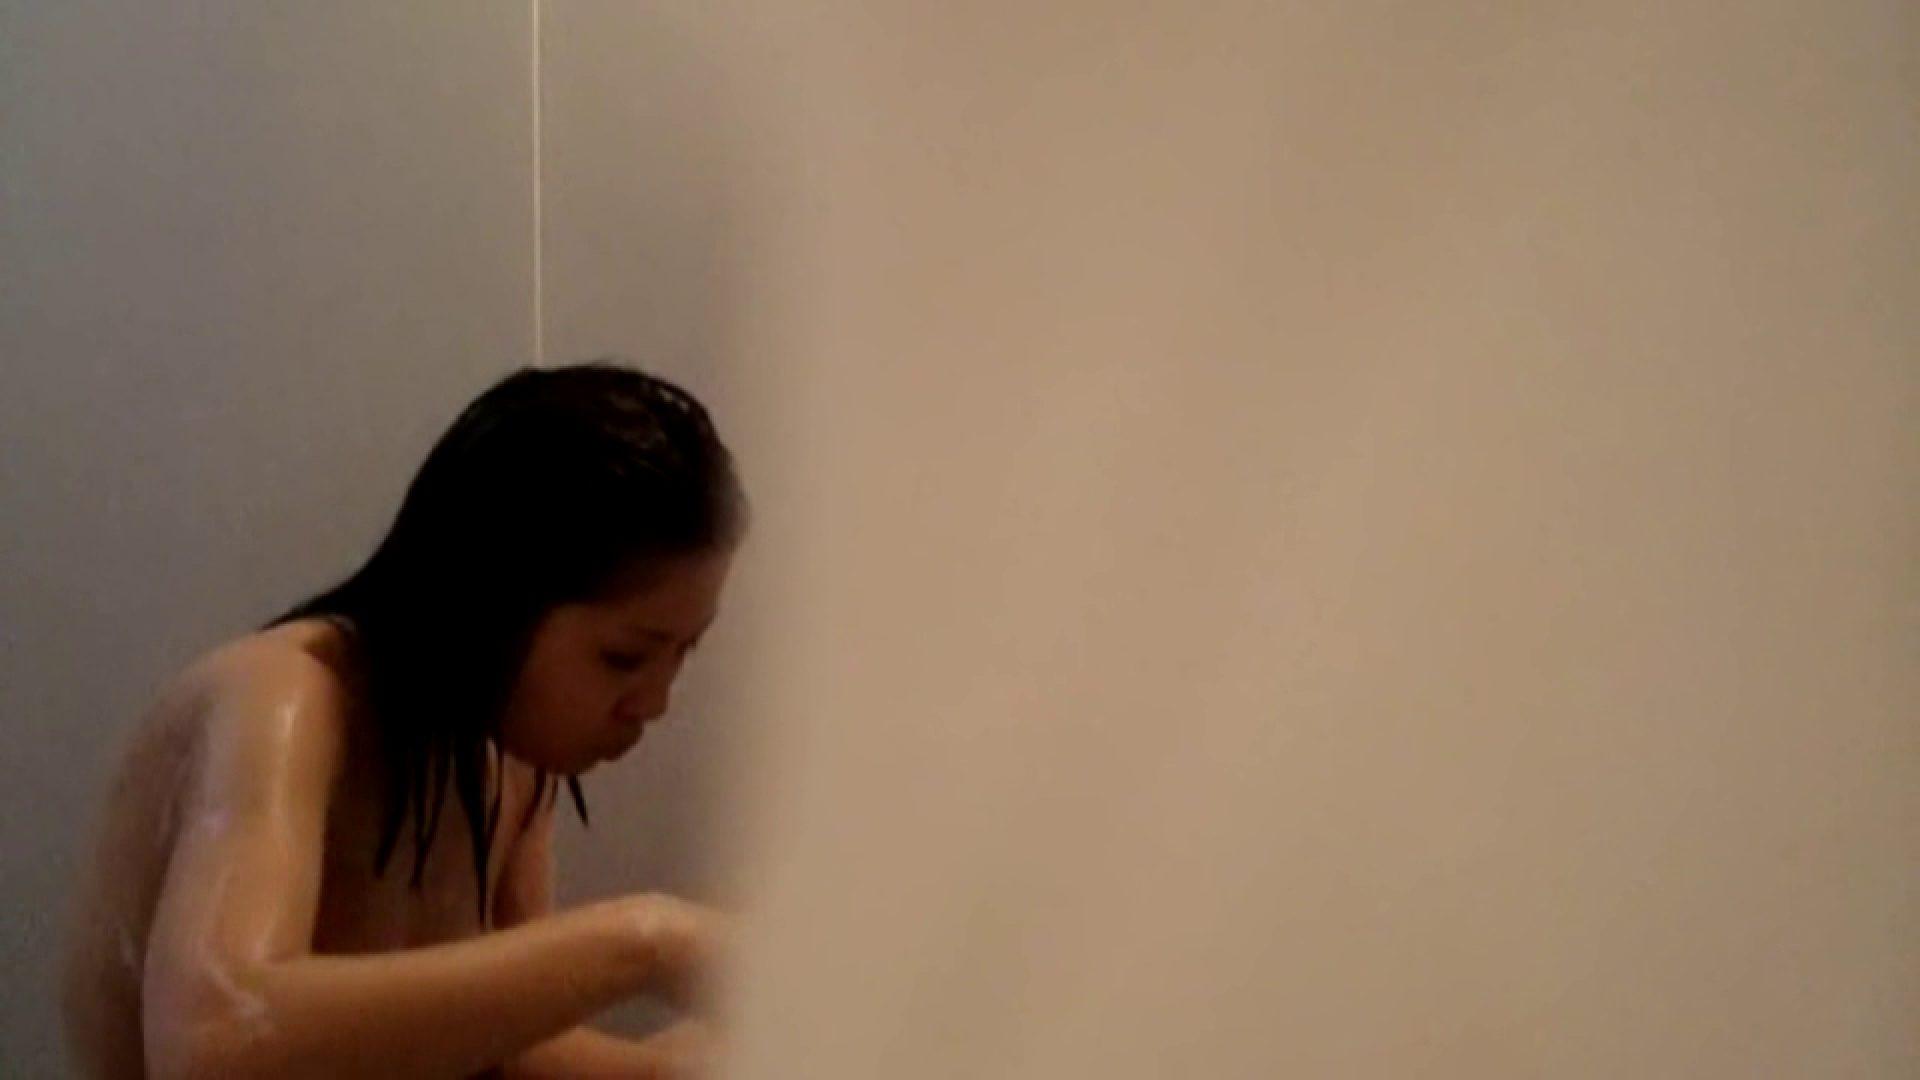 vol.2 葵のグラドル顔負けの爆乳を入浴シーンでどうぞ。 民家 オマンコ無修正動画無料 110枚 100